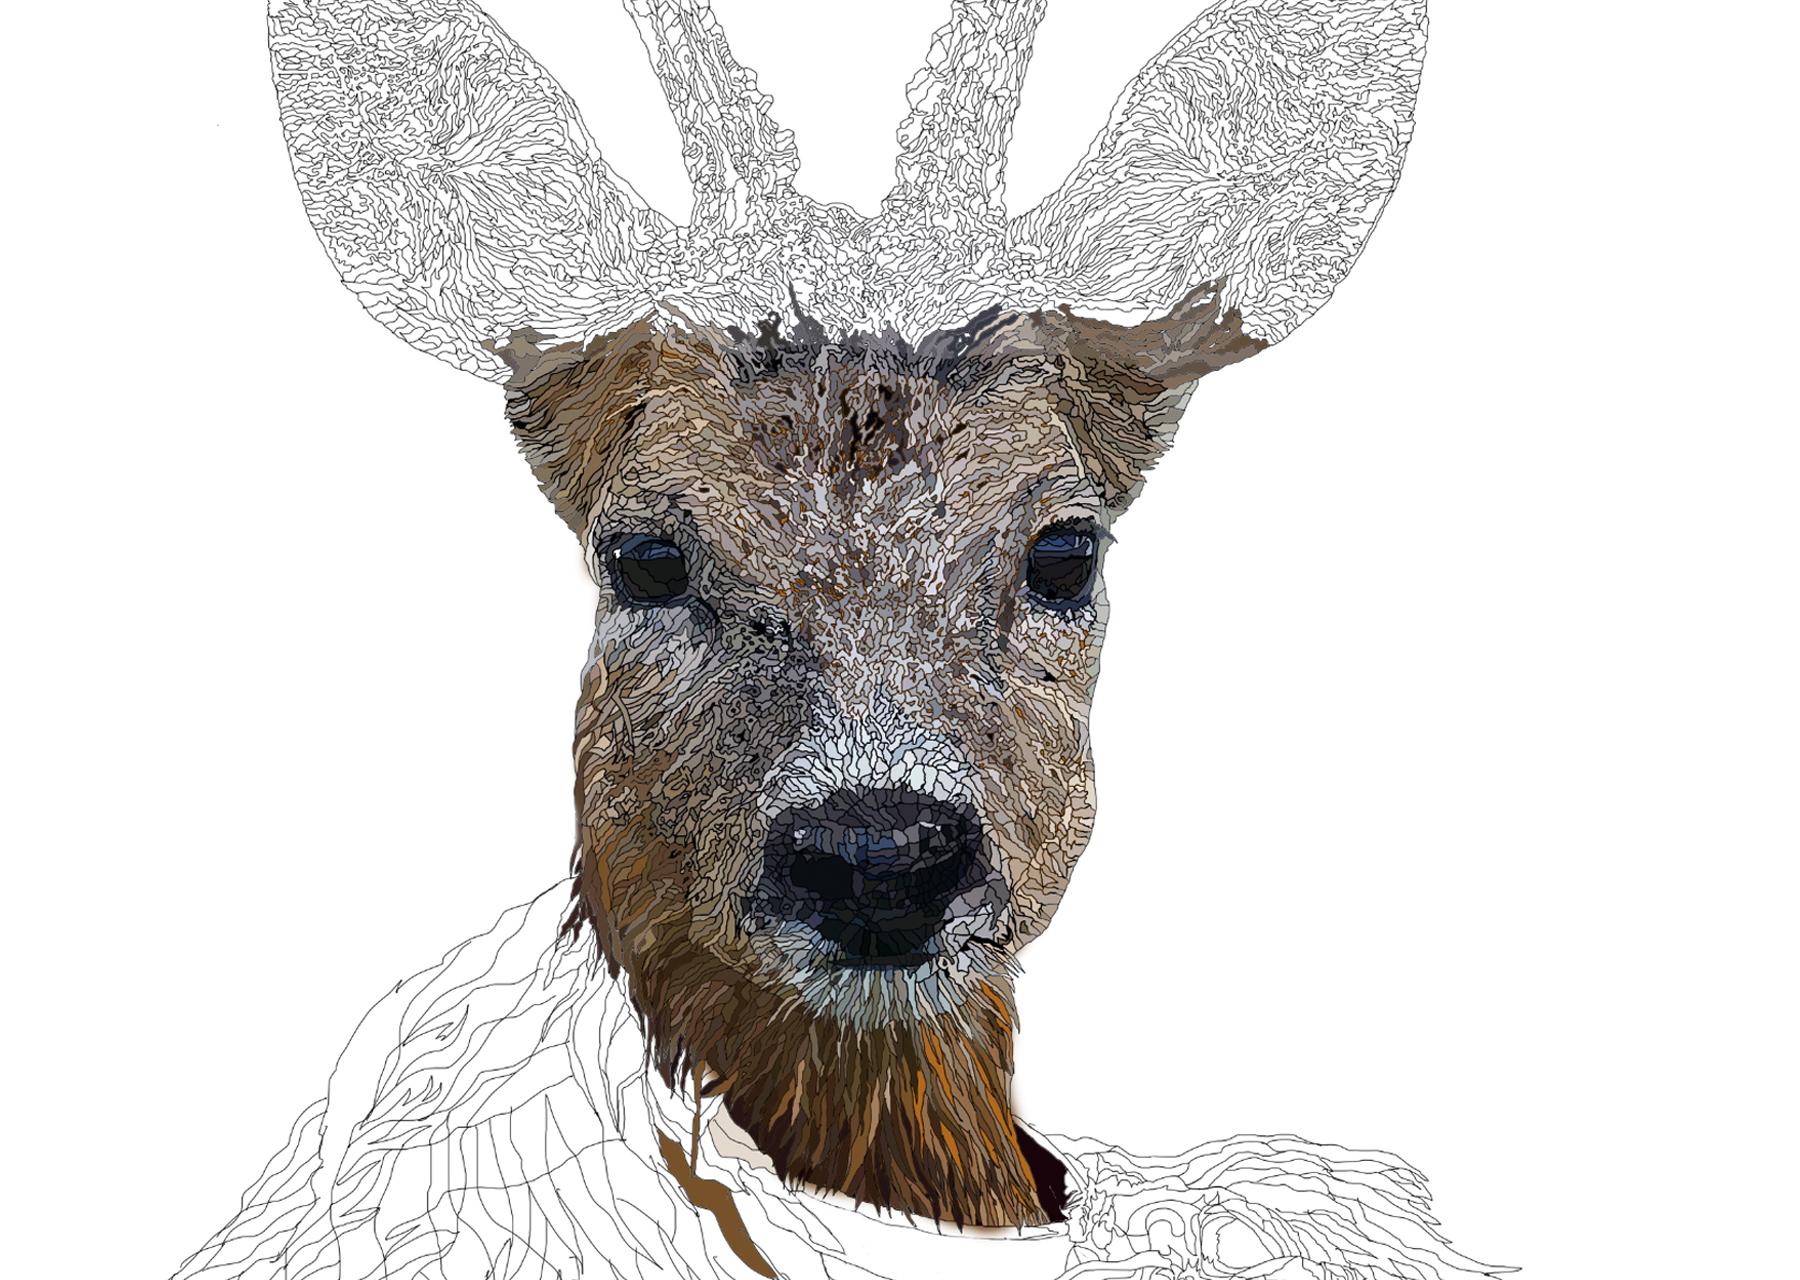 Line Drawing Deer : Deer family silhouette animal silhouettes fawn doe